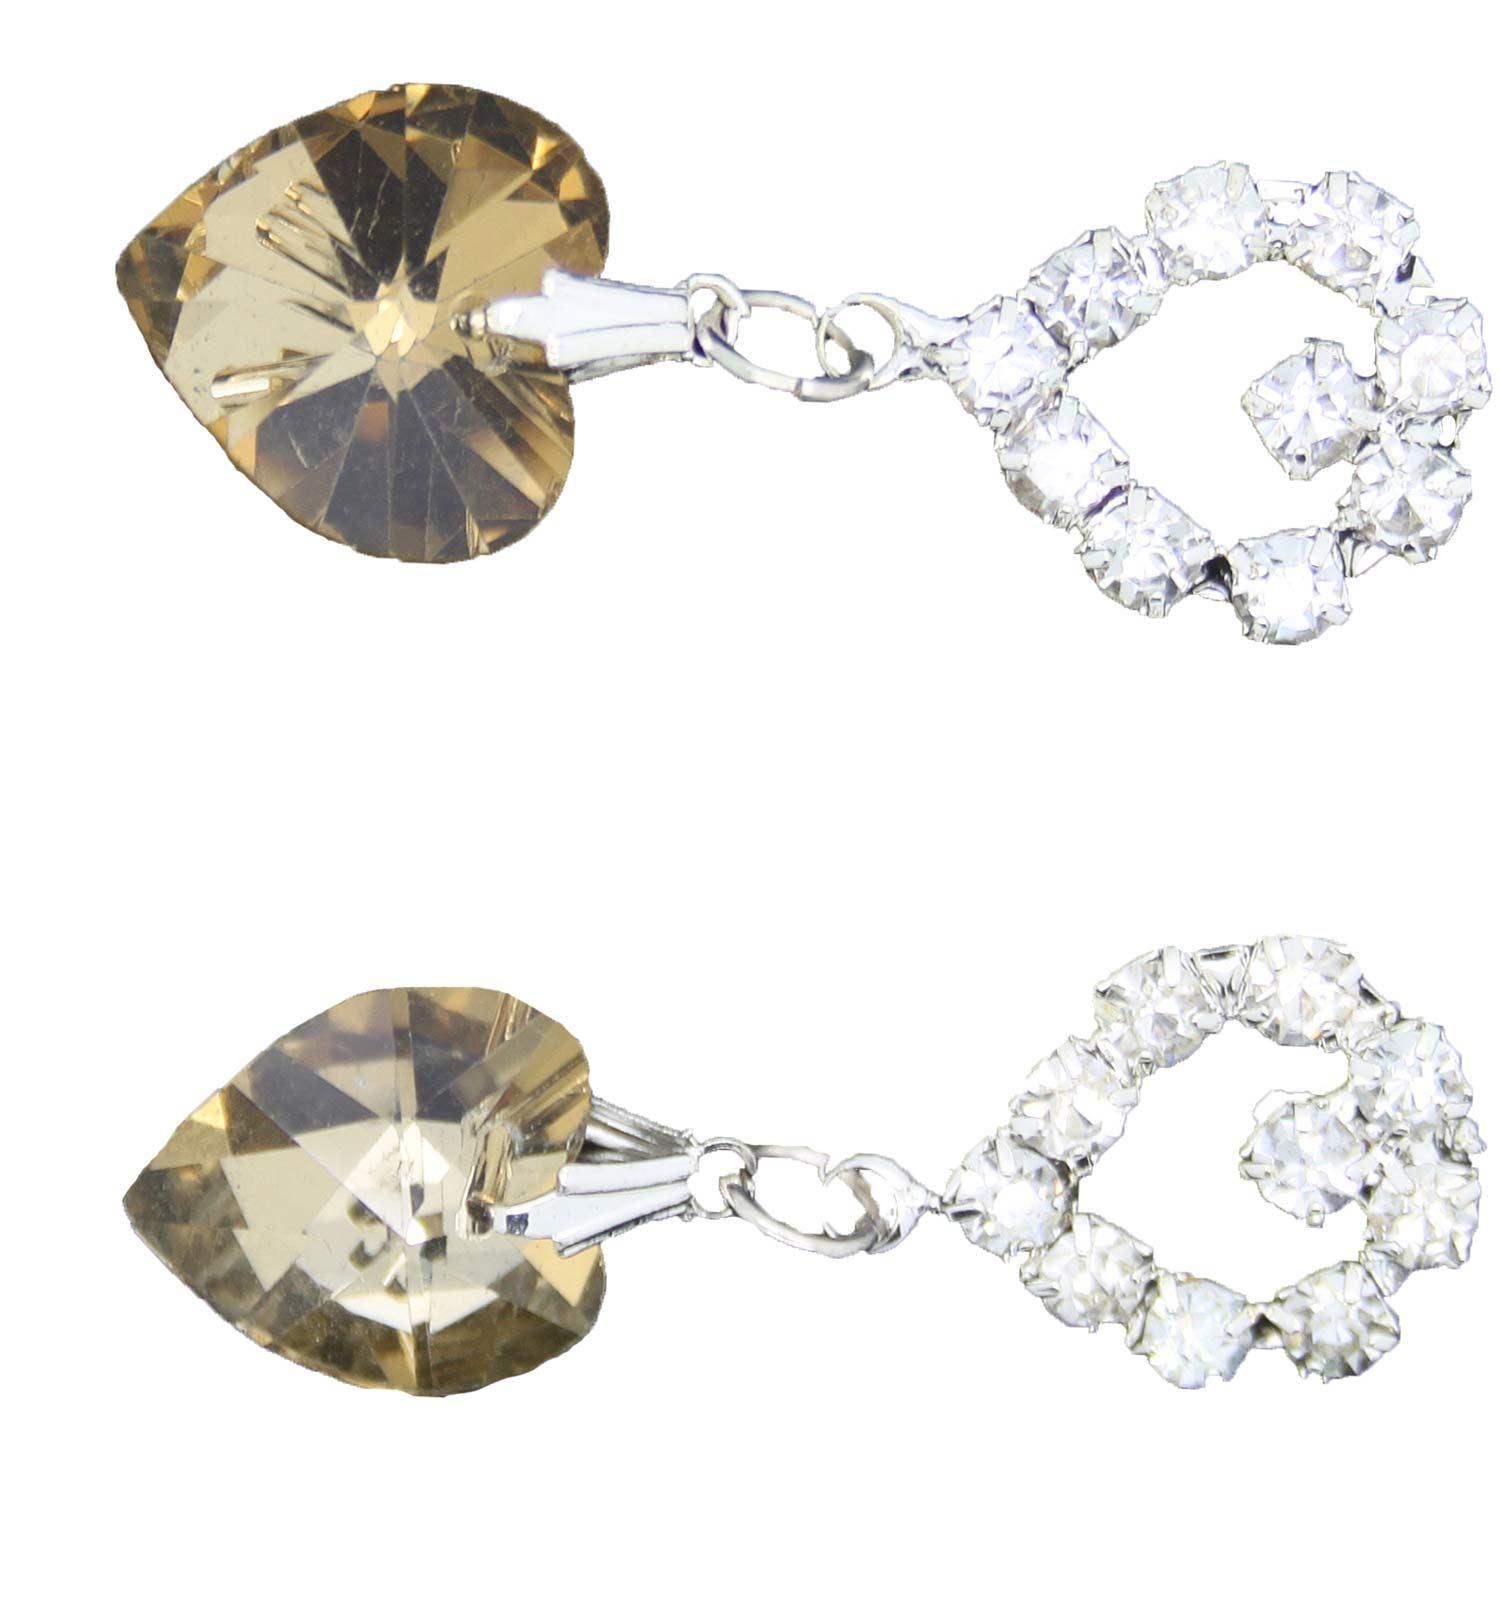 True-Face-Ladies-Women-039-s-Elegant-Earrings-Necklace-Set-Metal-Alloy-Jewellery thumbnail 18